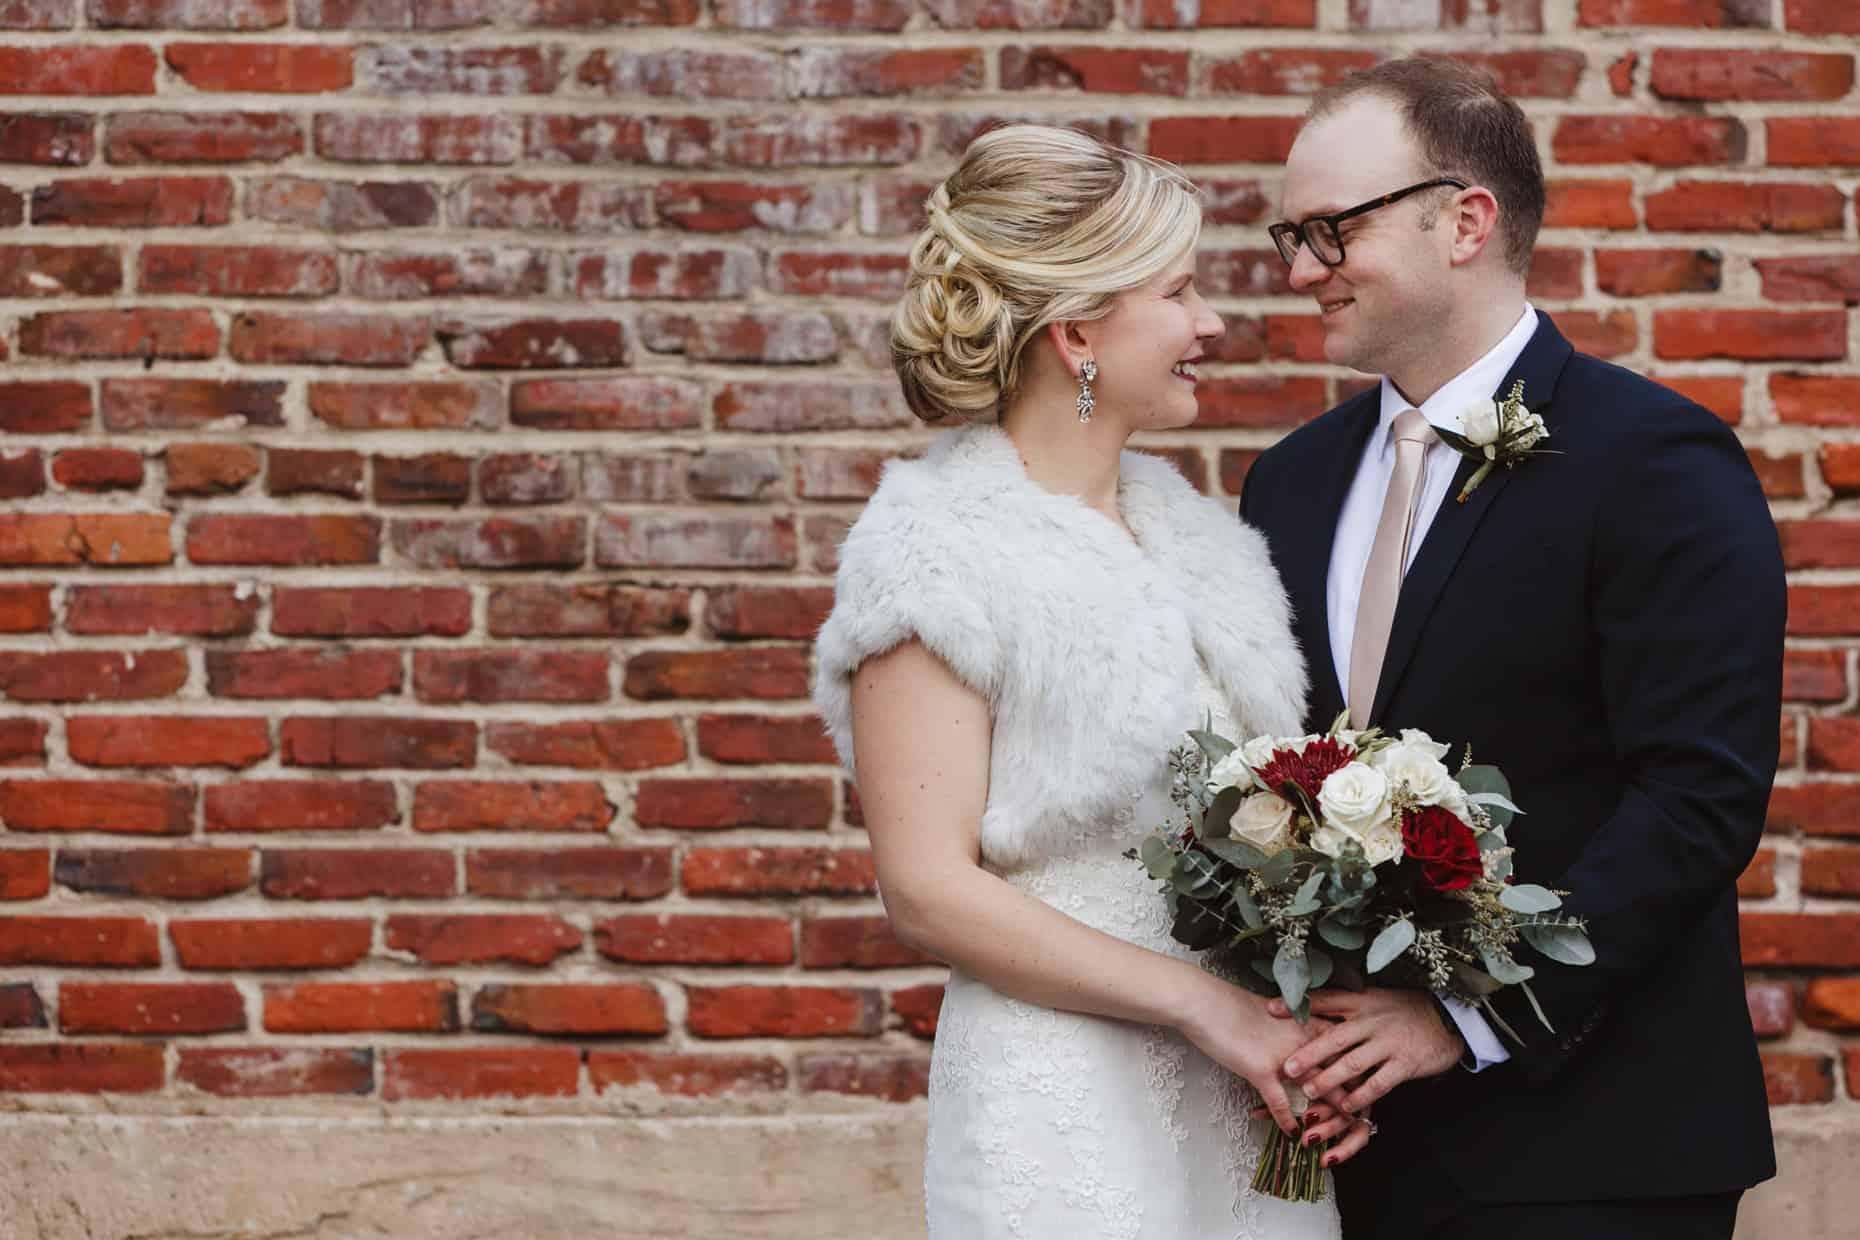 Delaware Center for Horticulture Wedding Pictures